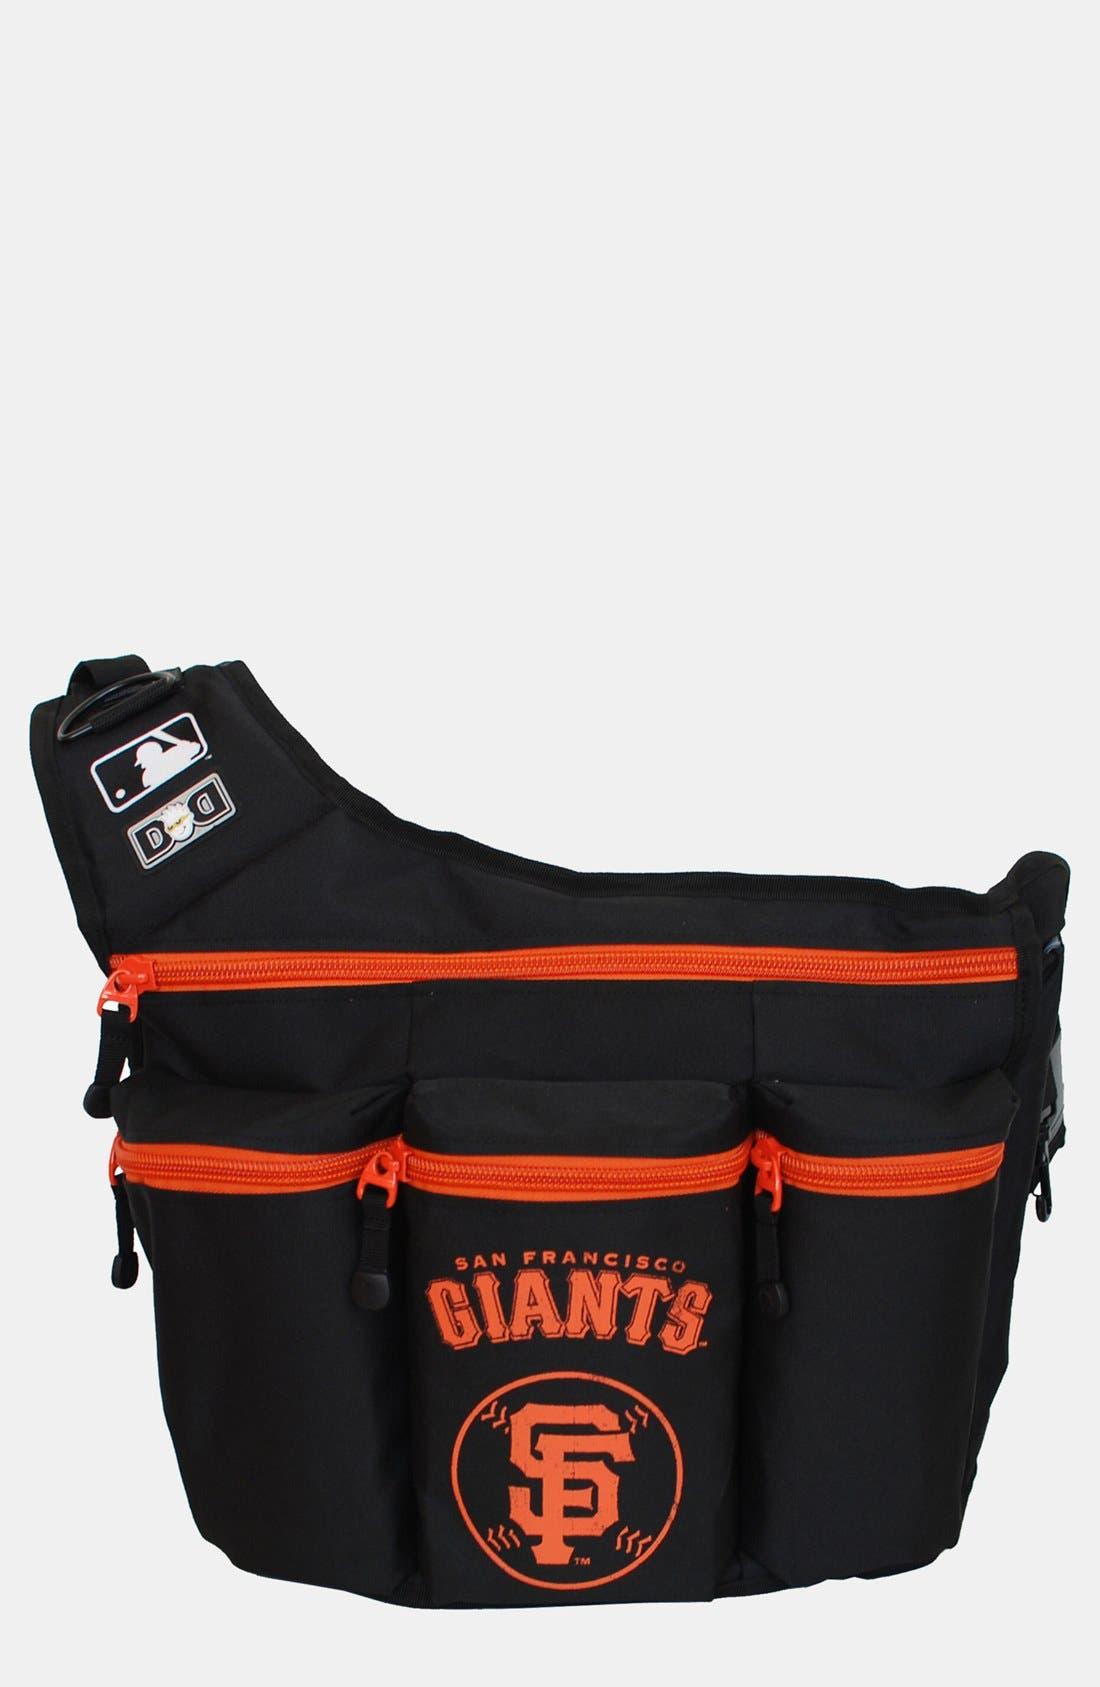 Diaper Dude San Francisco Giants Messenger Diaper Bag